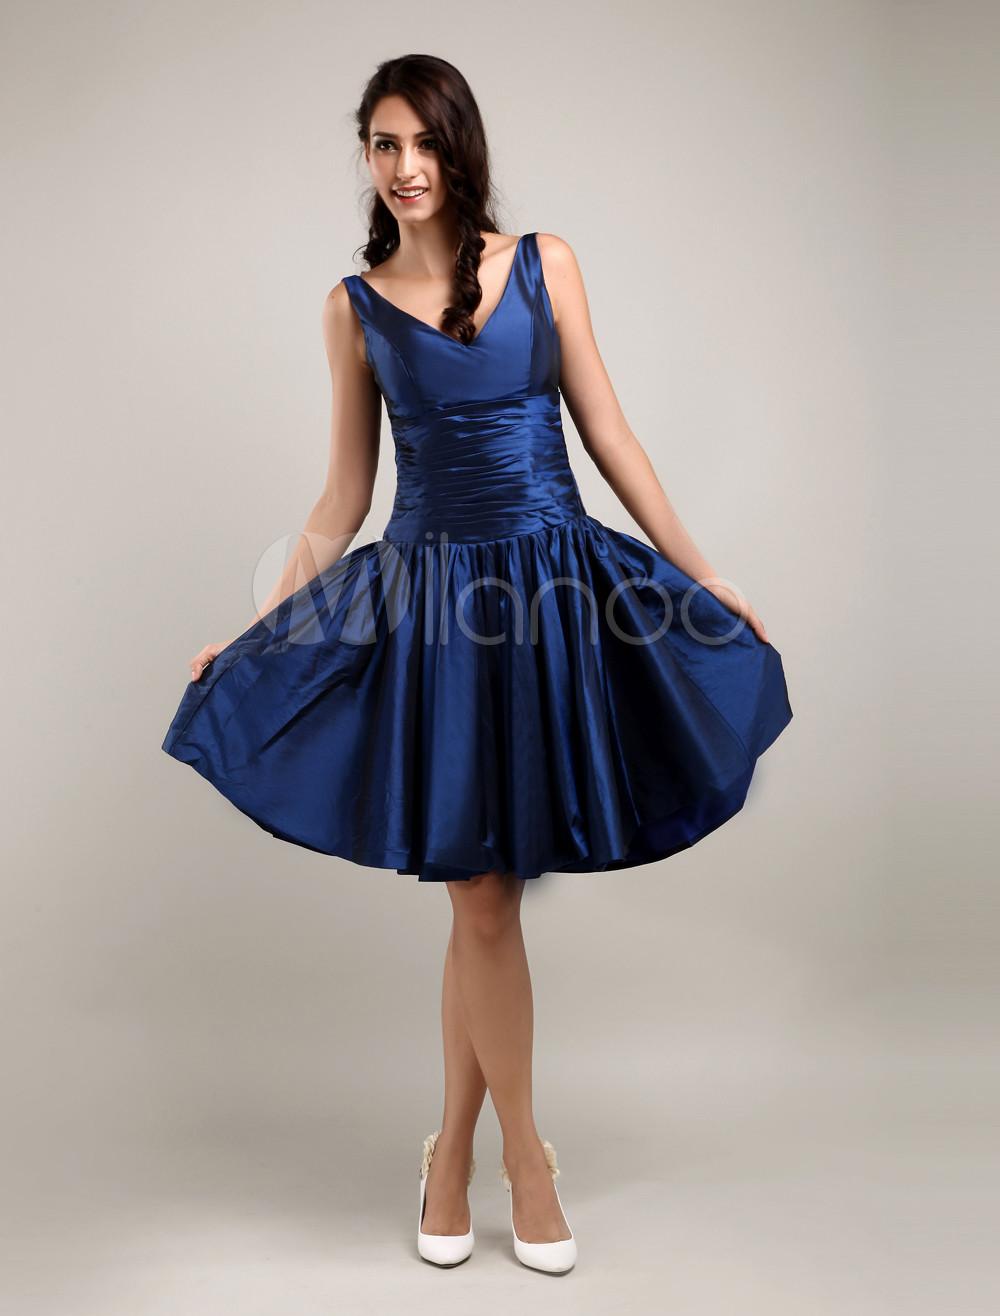 Enticing V-Neck Pleated Knee Length Taffeta Bridesmaid Dress